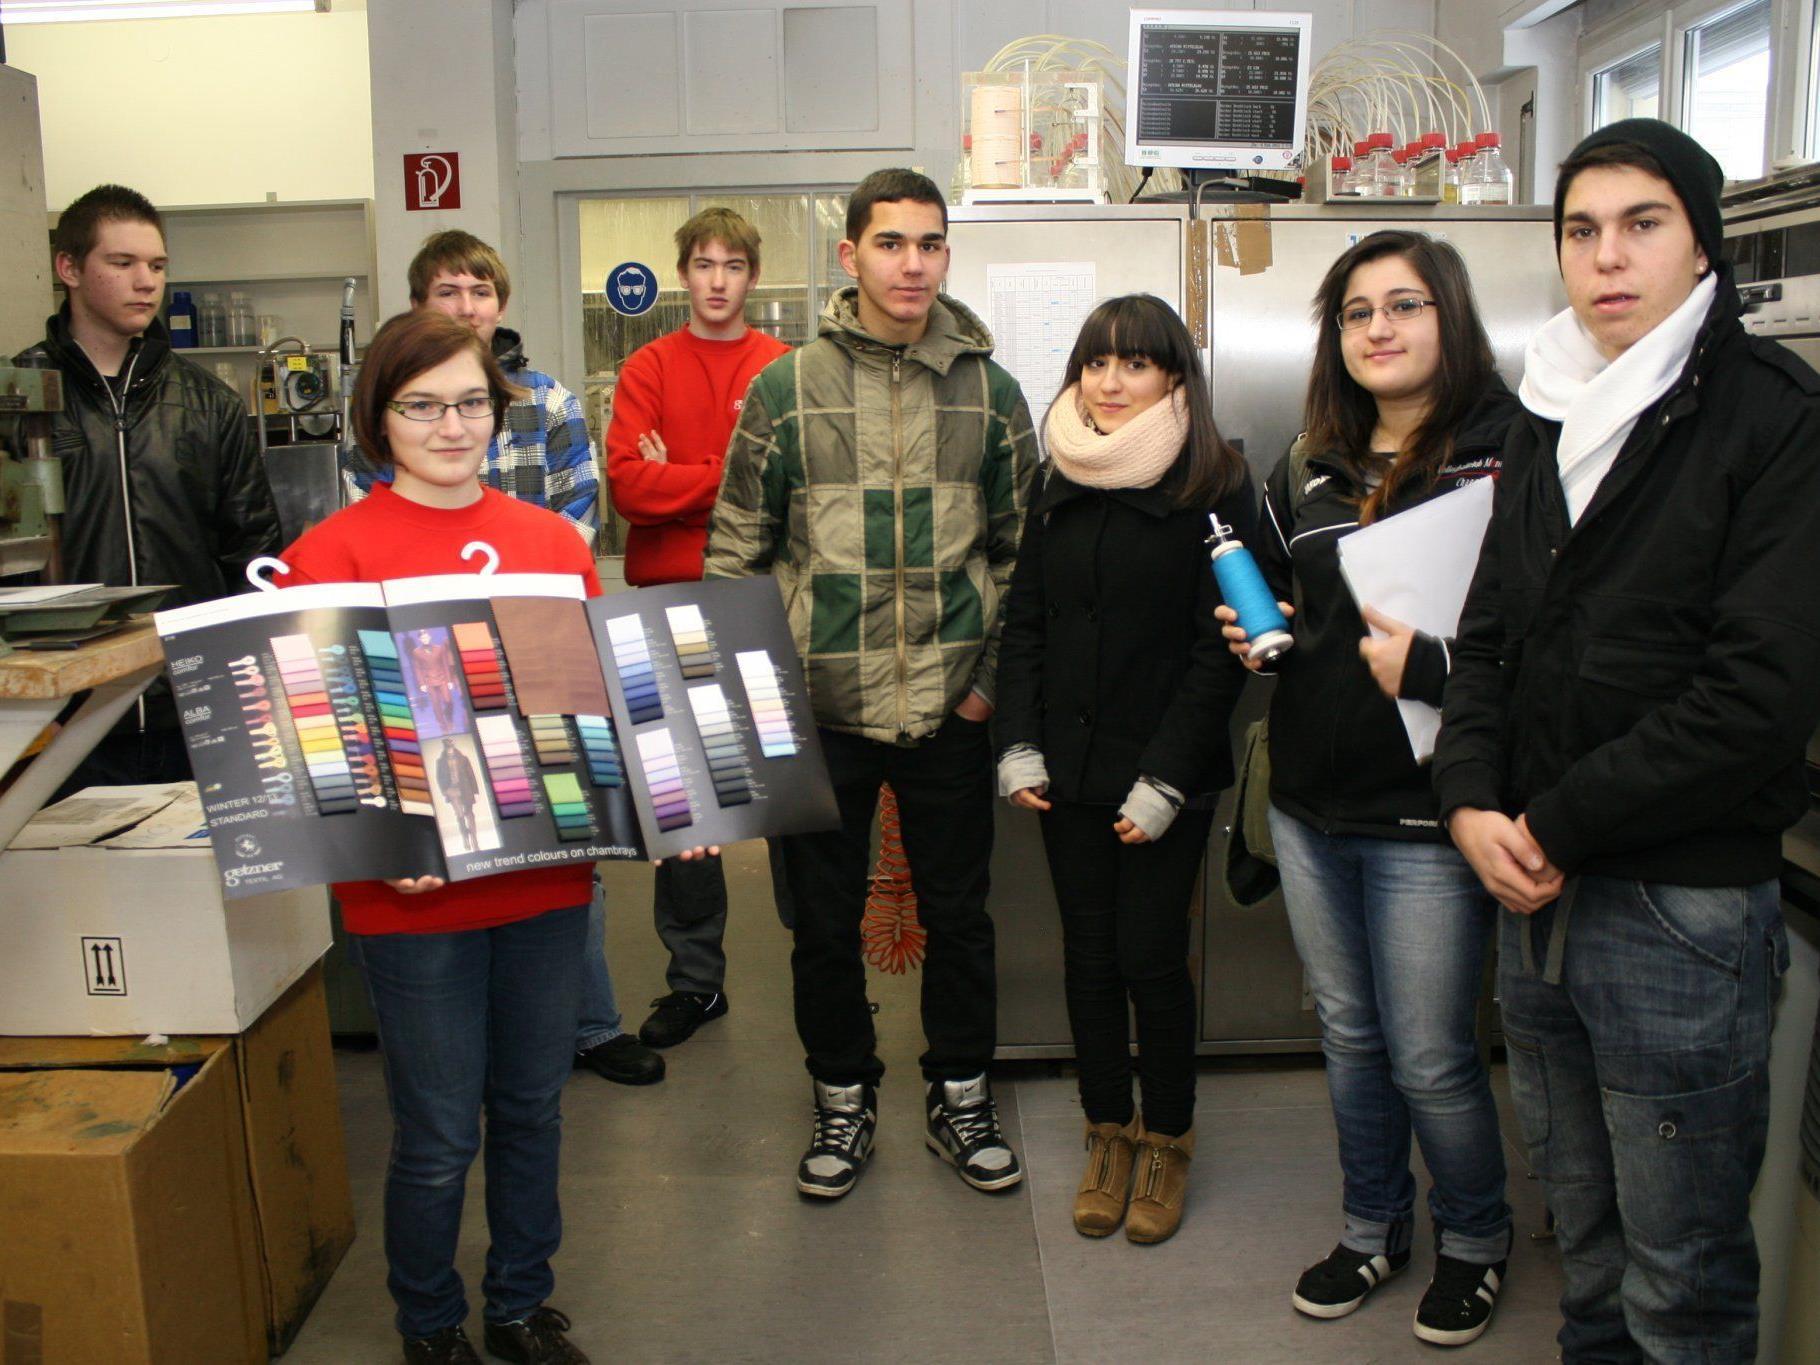 Volles Haus bi Getzner Textil in Bludenz am Lehrlingsinfotag.